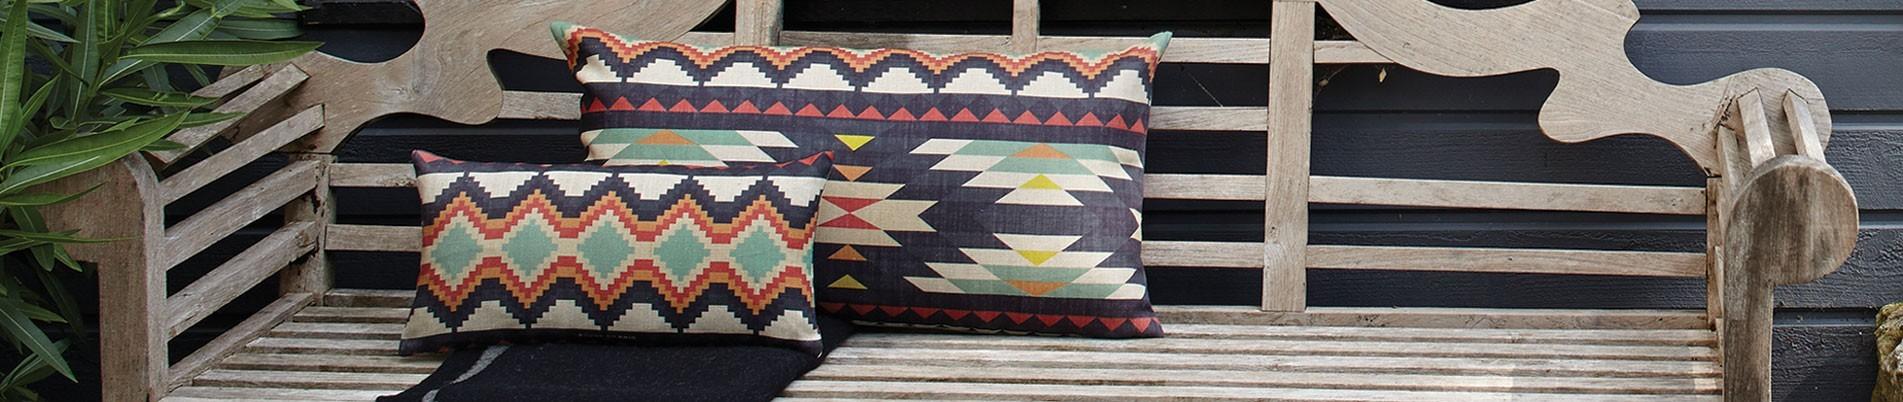 elsewhere cushions